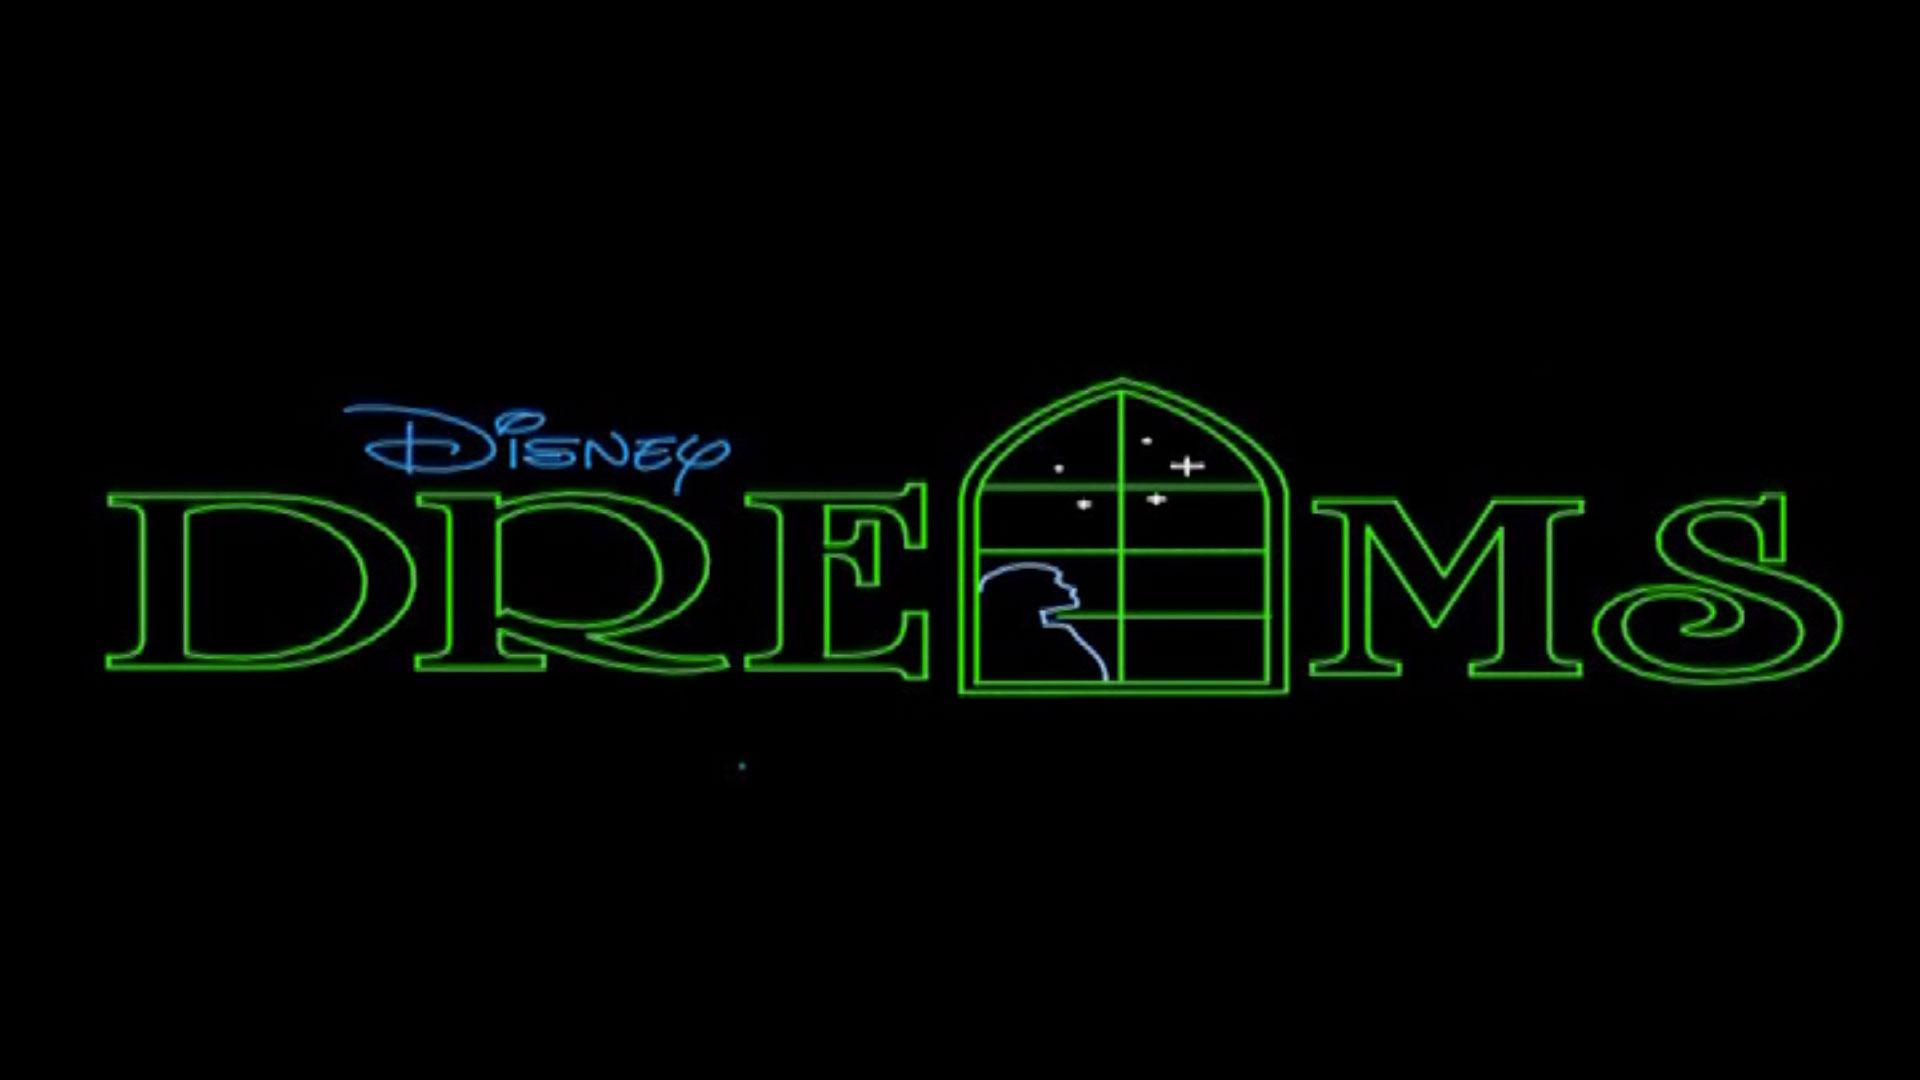 DCL Disney Dreams Show Final Screen Logo